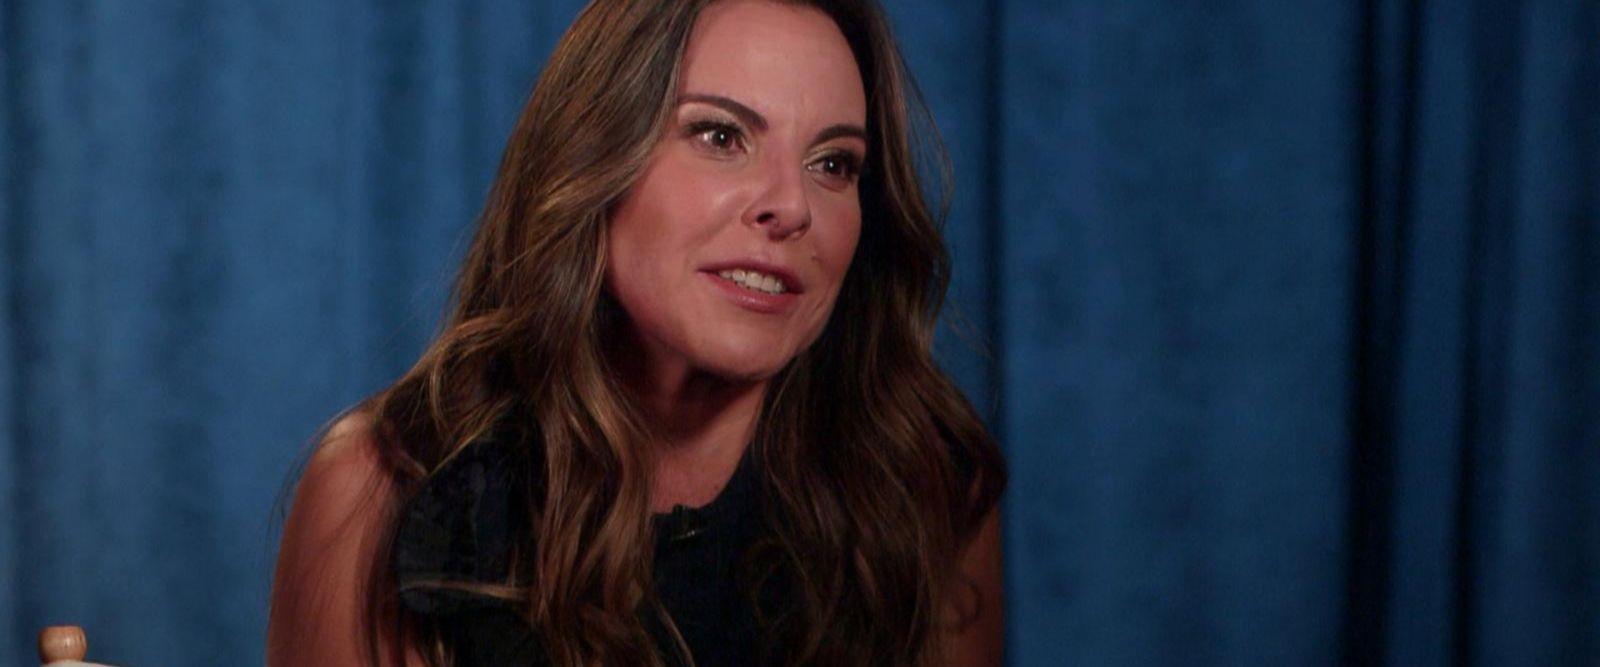 VIDEO: Kate del Castillo tells her side of 'El Chapo' story